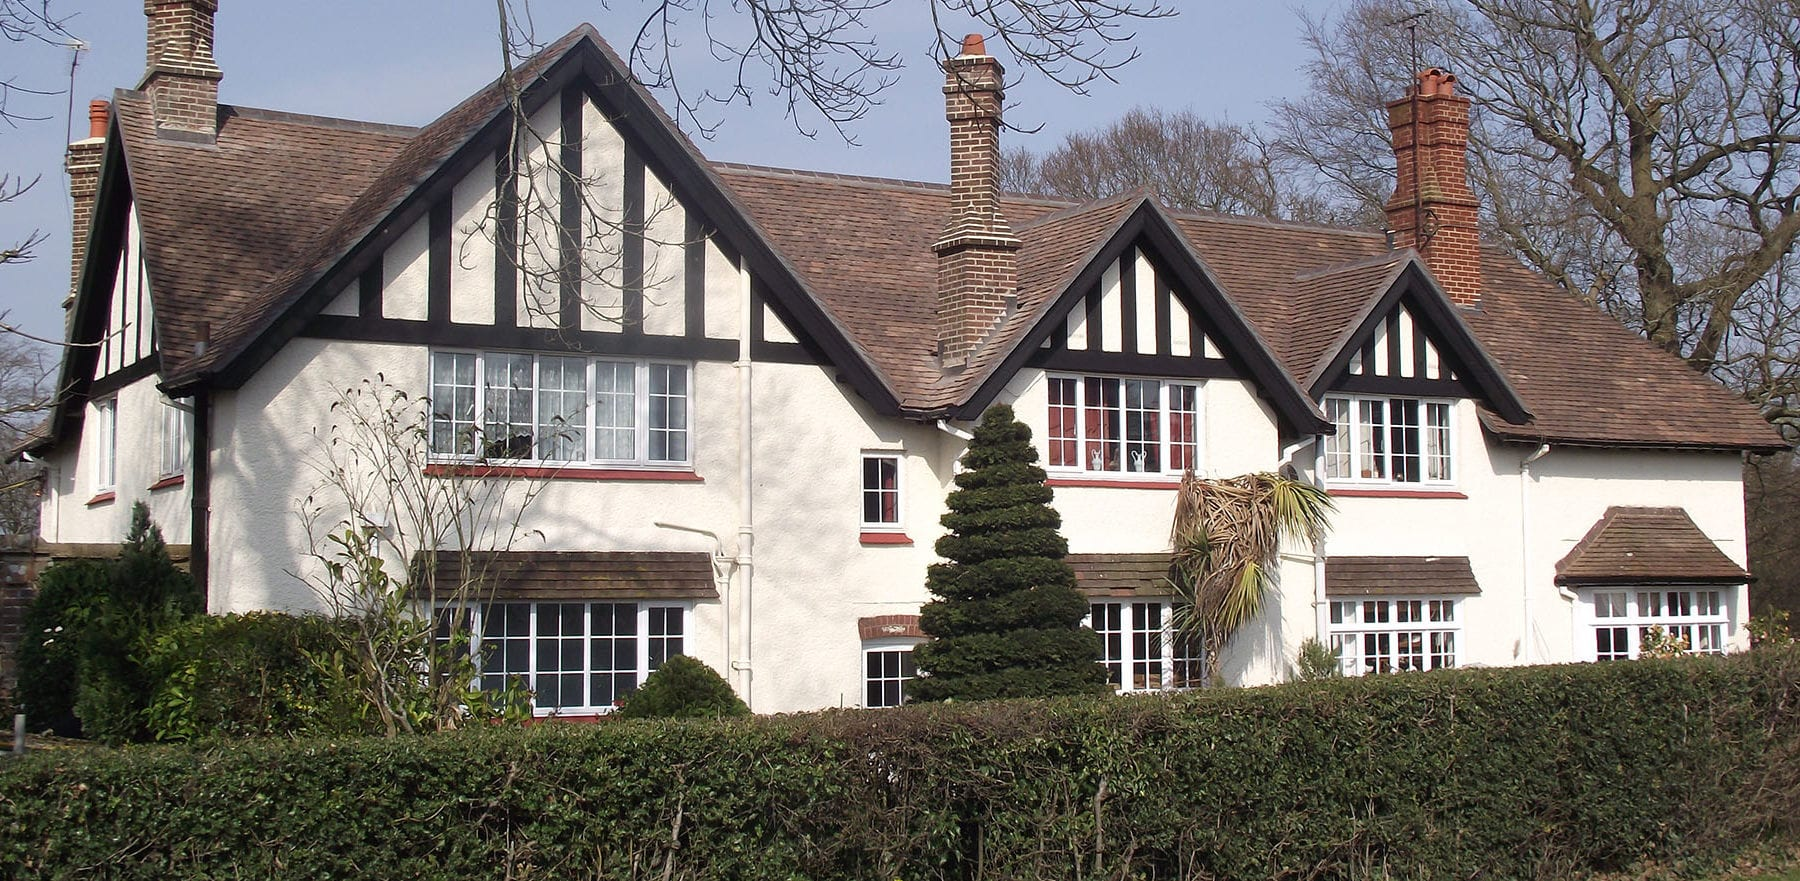 Lifestiles - Handmade Restoration Clay Roof Tiles - Cuckfield, England 2